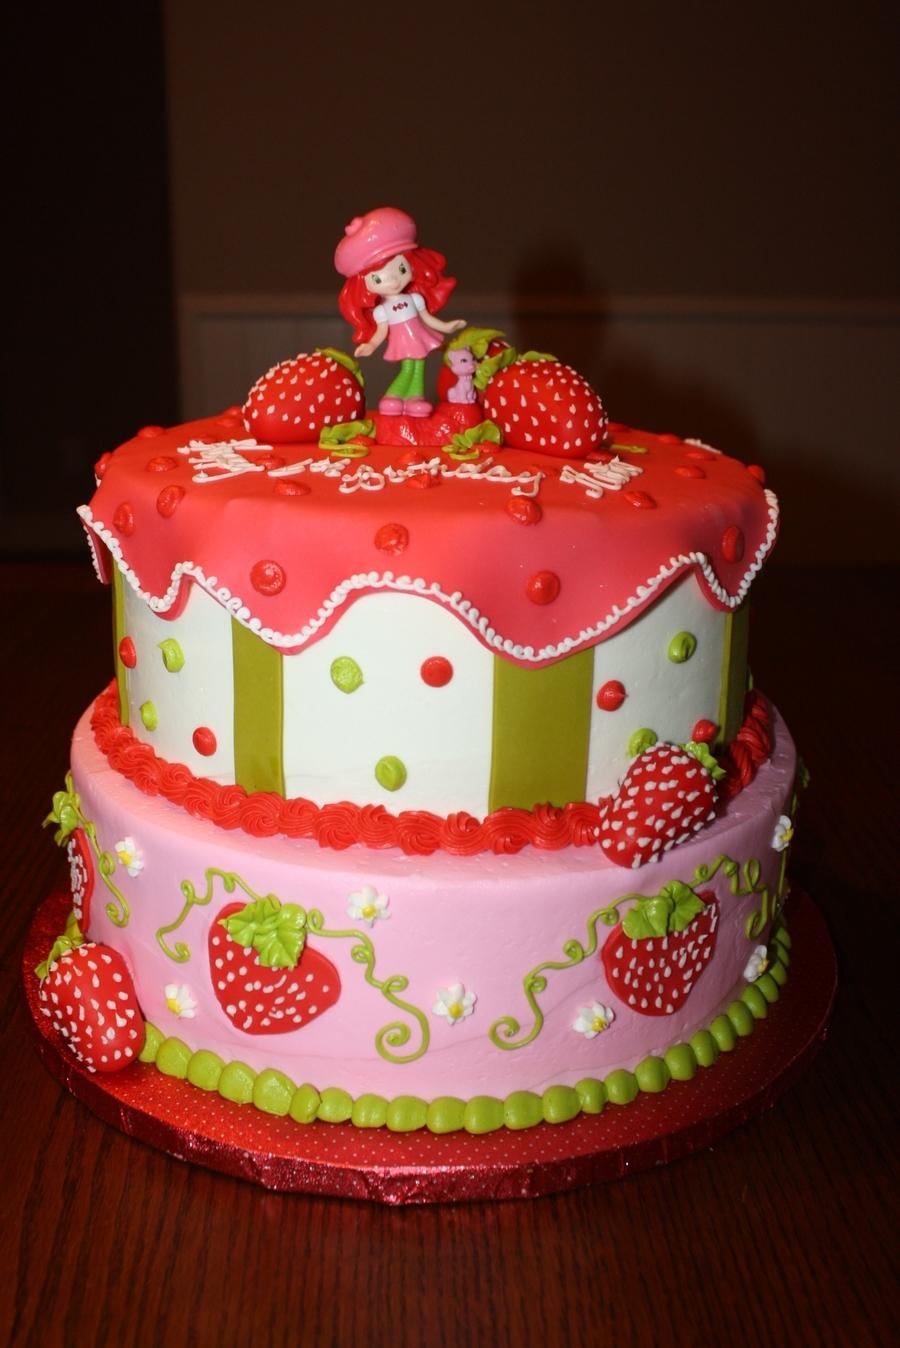 Astonishing Strawberry Shortcake Birthday Cake Cakecentral Com Personalised Birthday Cards Beptaeletsinfo